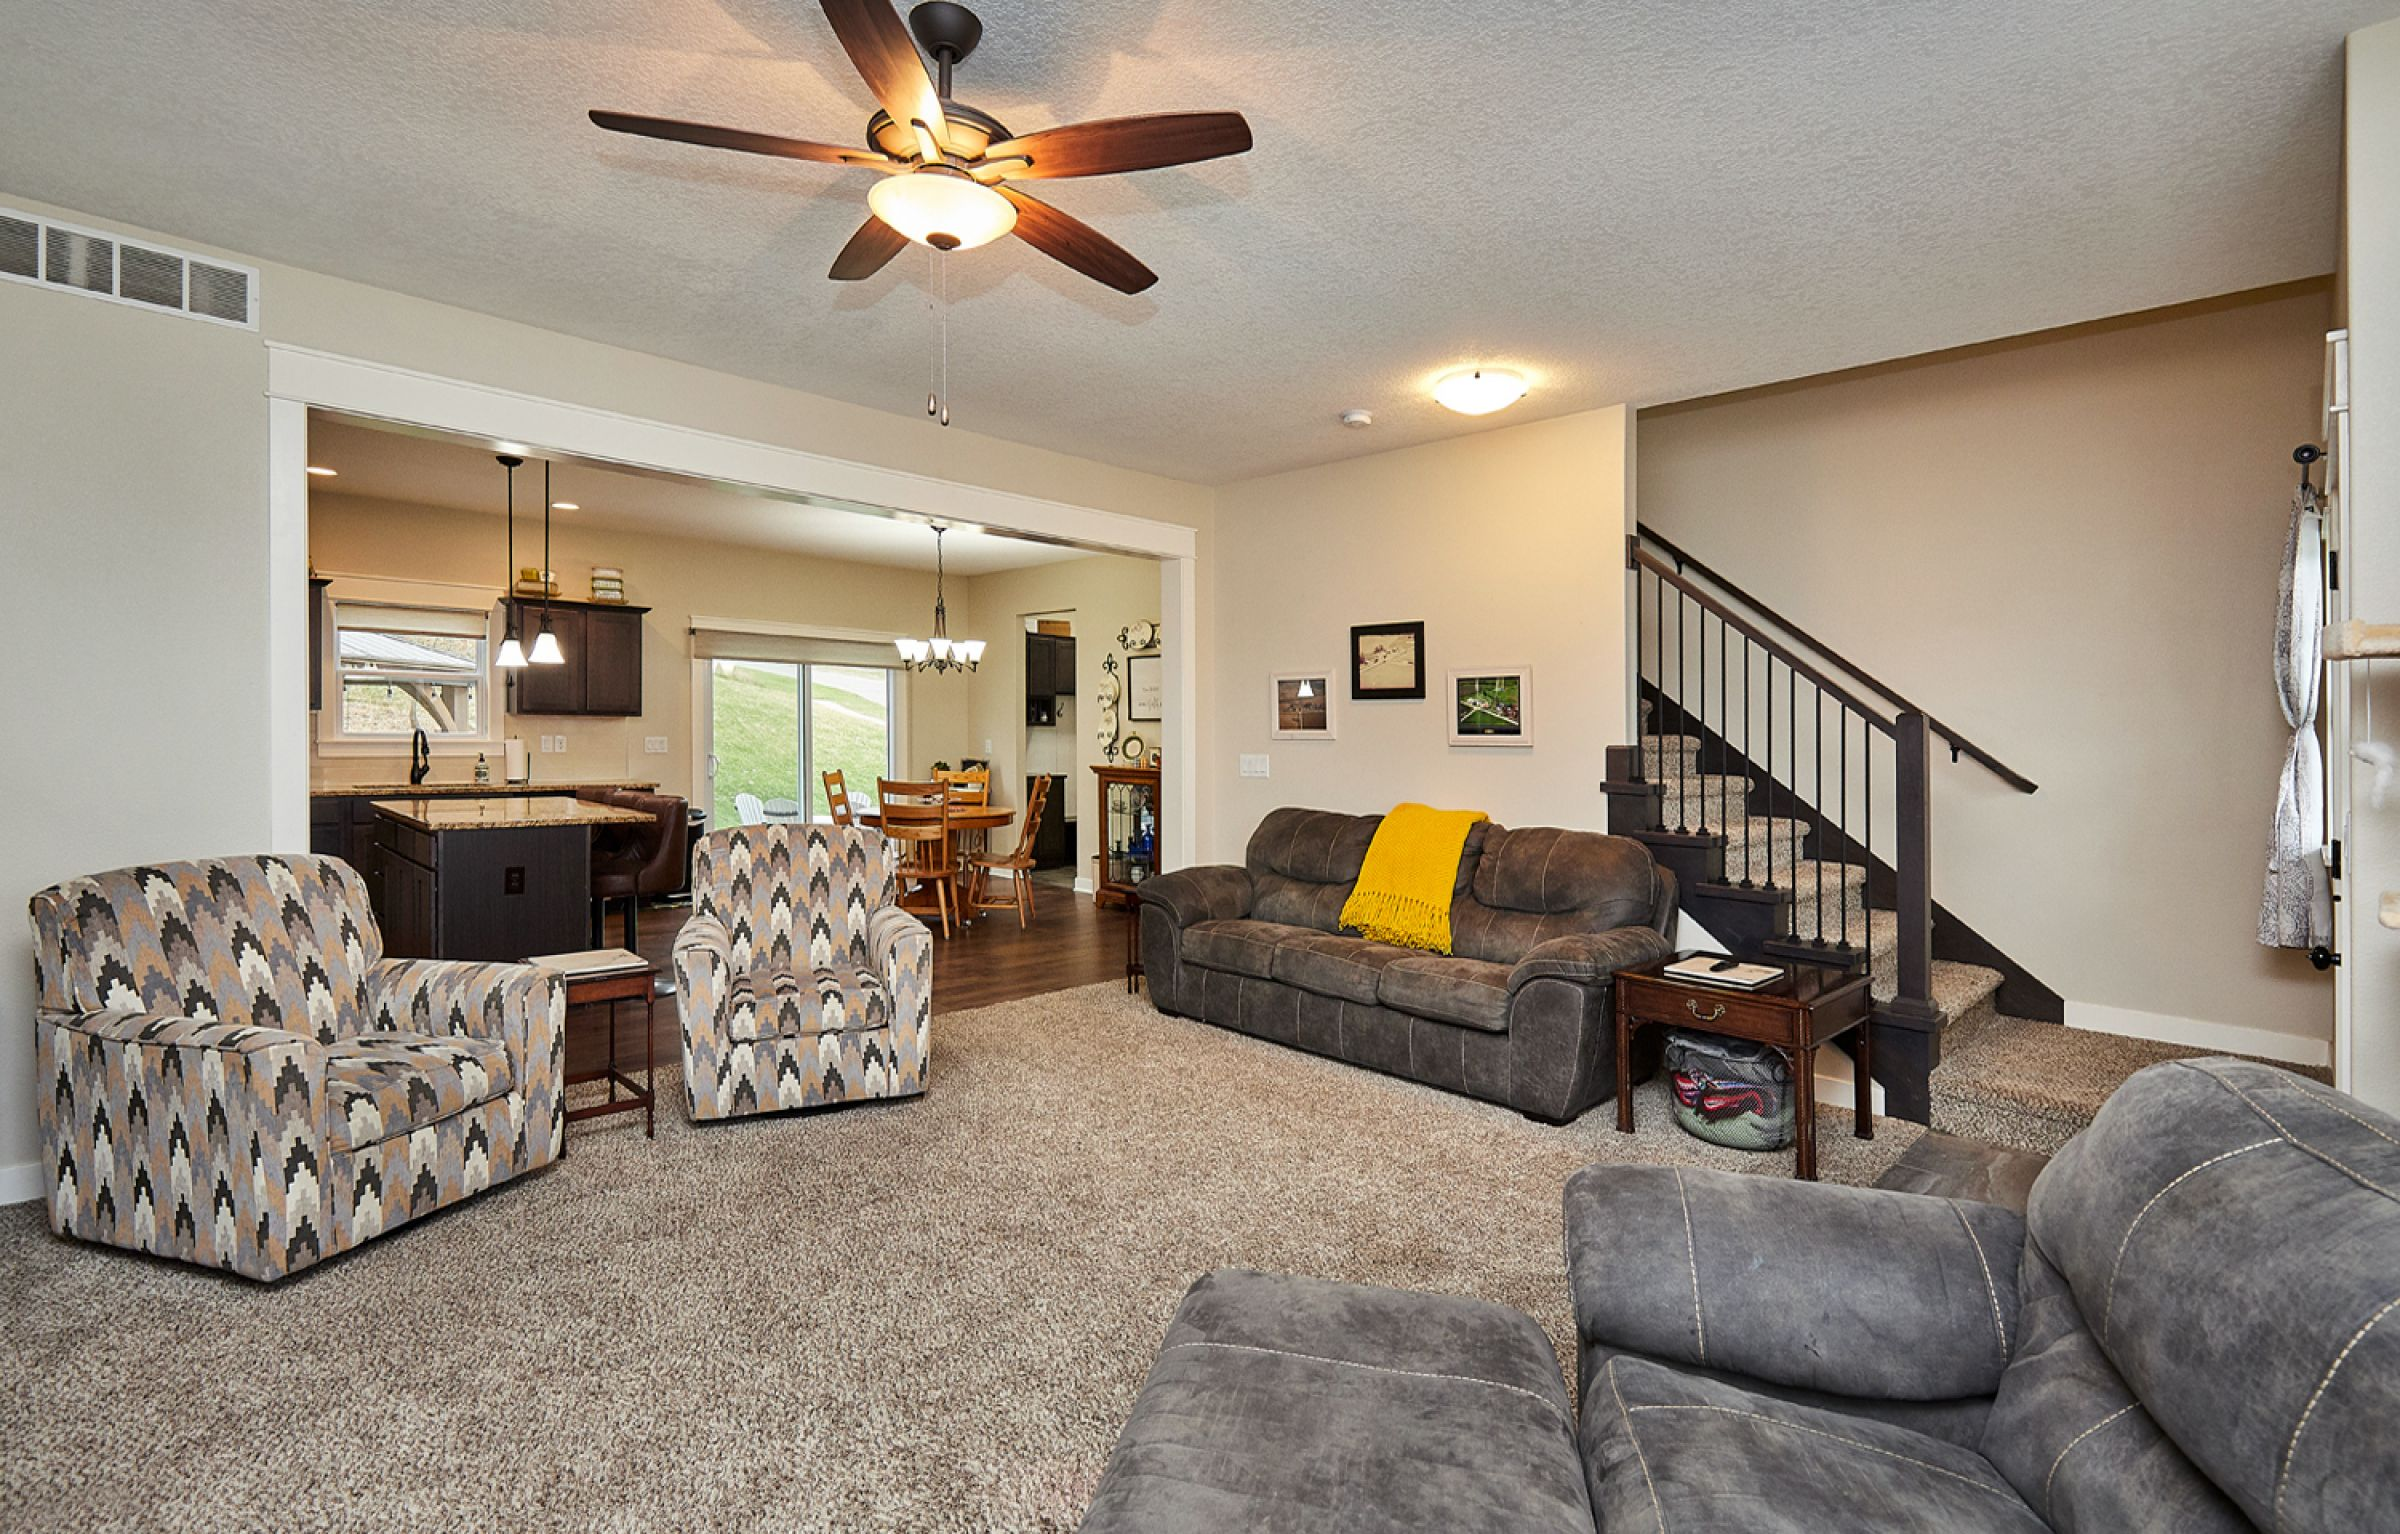 residential-warren-county-iowa-1-acres-listing-number-15254-12-2020-11-11-165821.jpg